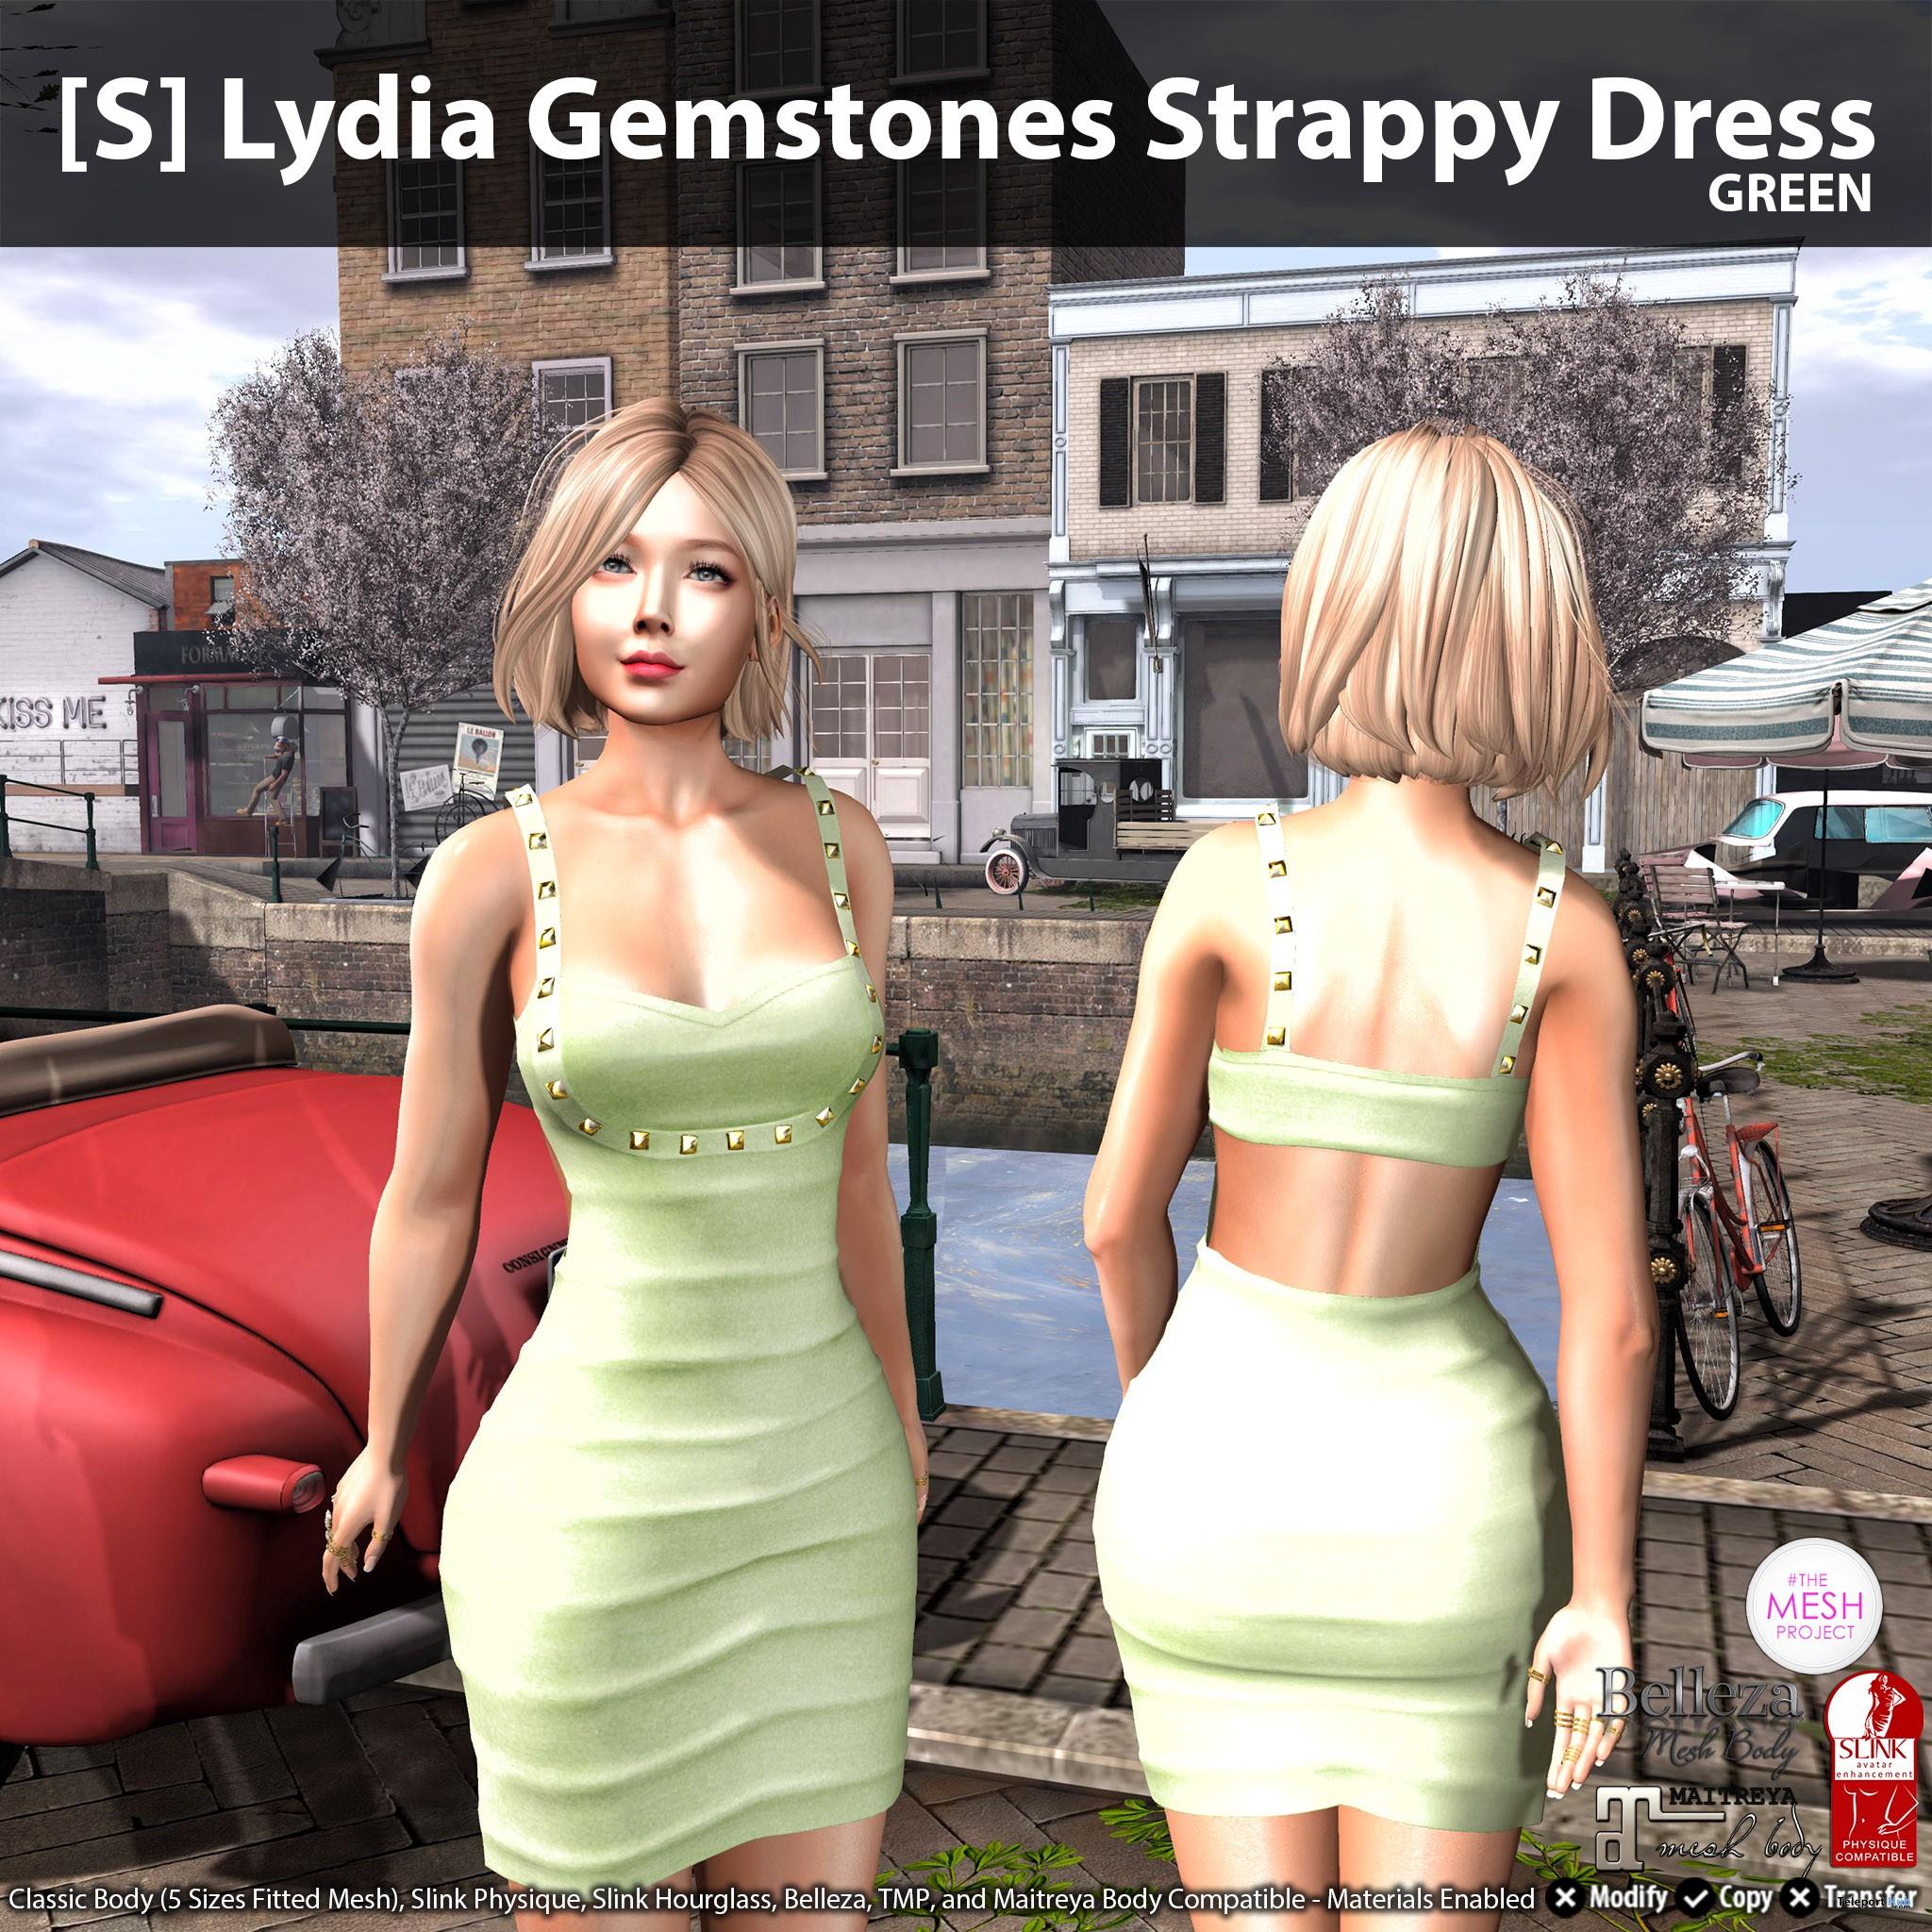 New Release: [S] Lydia Gemstones Strappy Dress by [satus Inc] - Teleport Hub - teleporthub.com